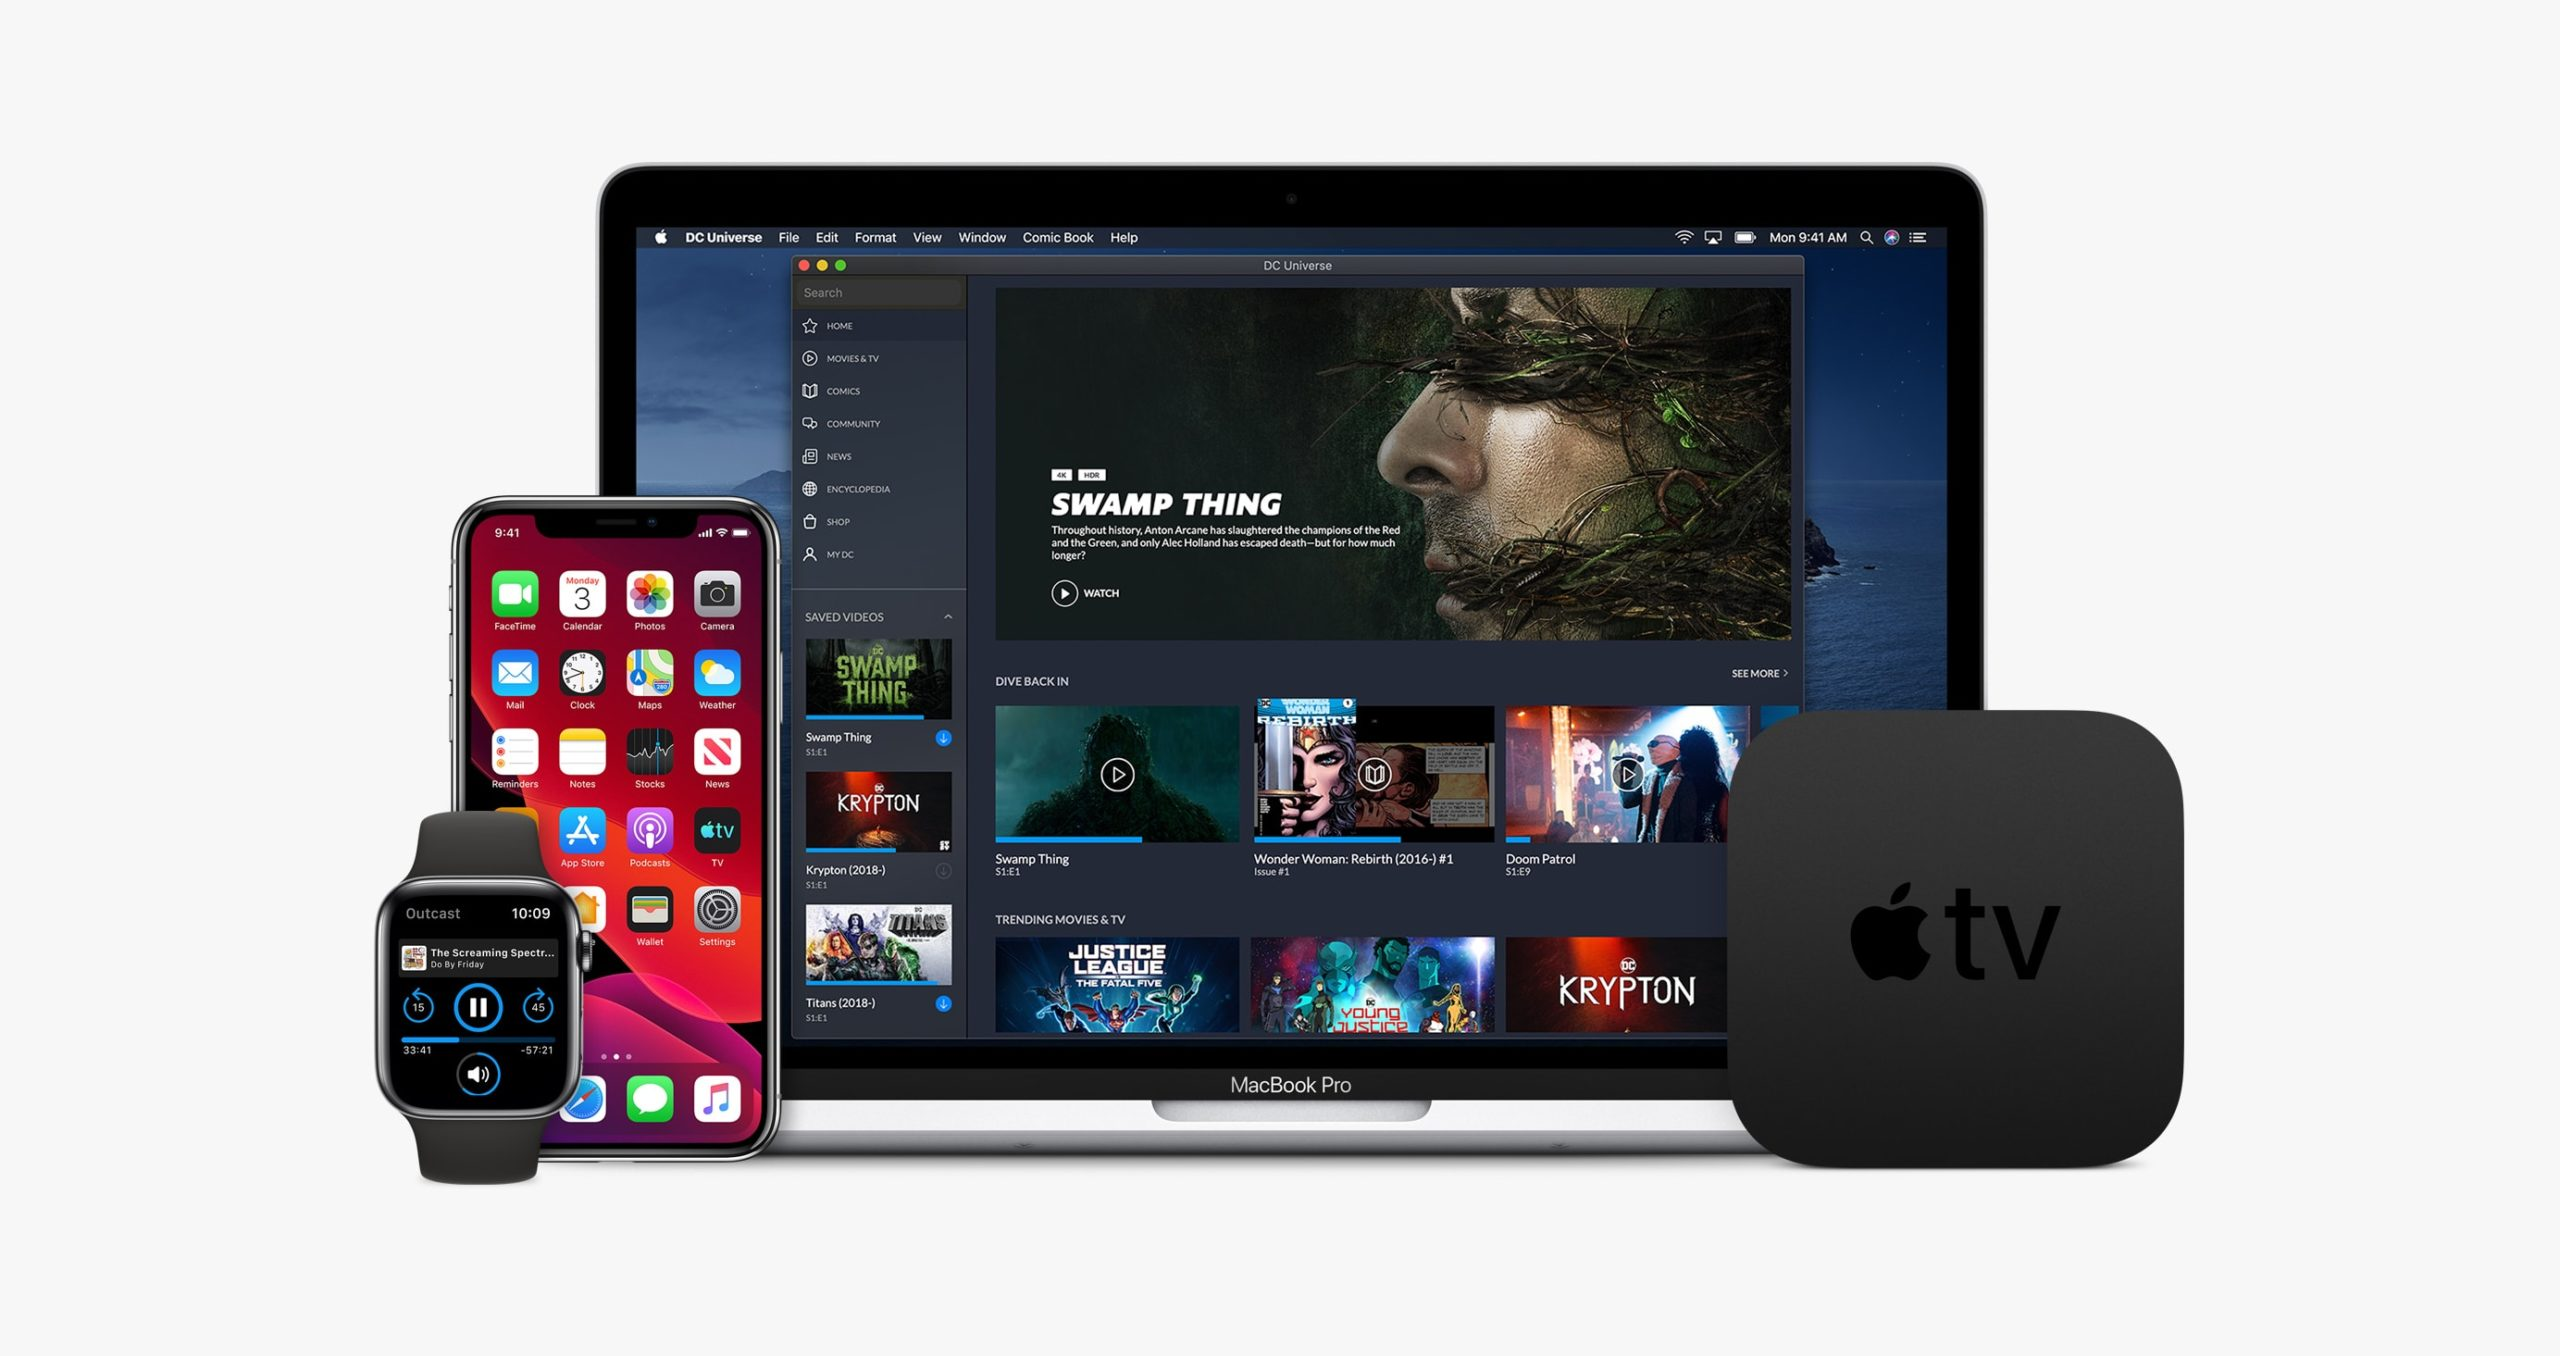 Dispositivos da Apple - Apple Watch (watchOS 6), iPhone (iOS 13), MacBook Pro (macOS Catalina 10.15) e Apple TV (tvOS 13)